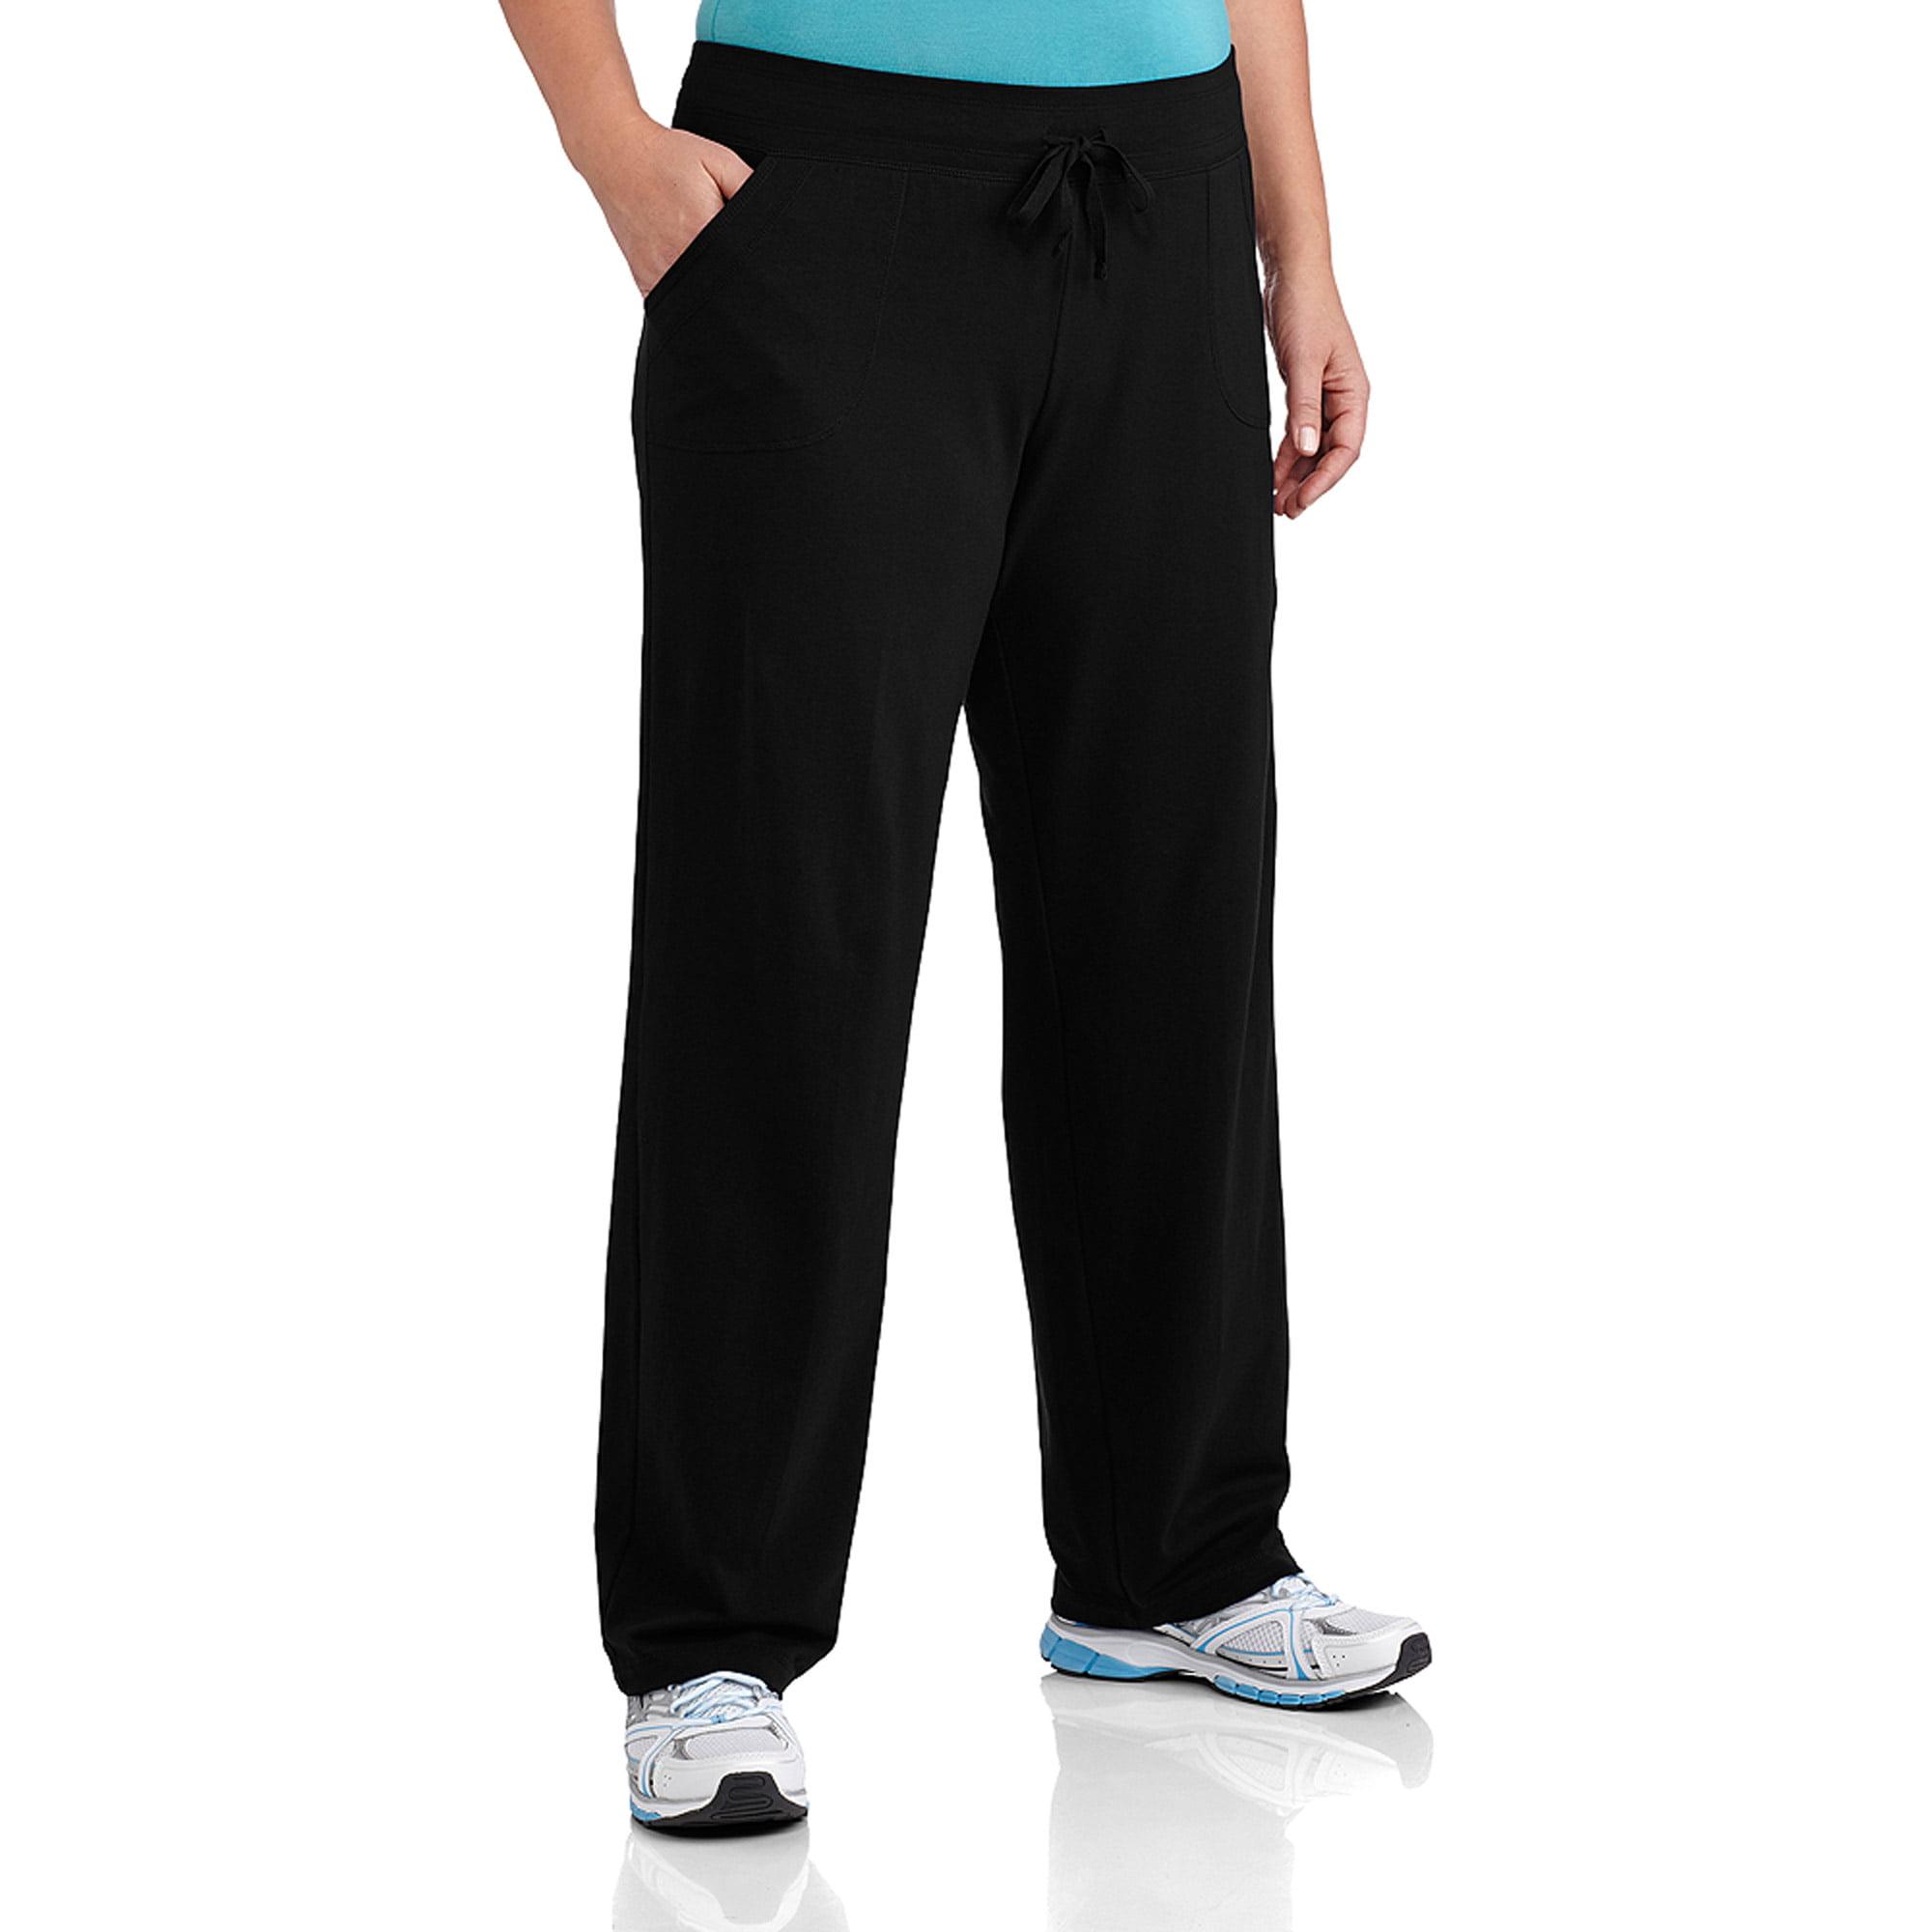 Danskin Now Women's Plus-Size Basic Knit Pants